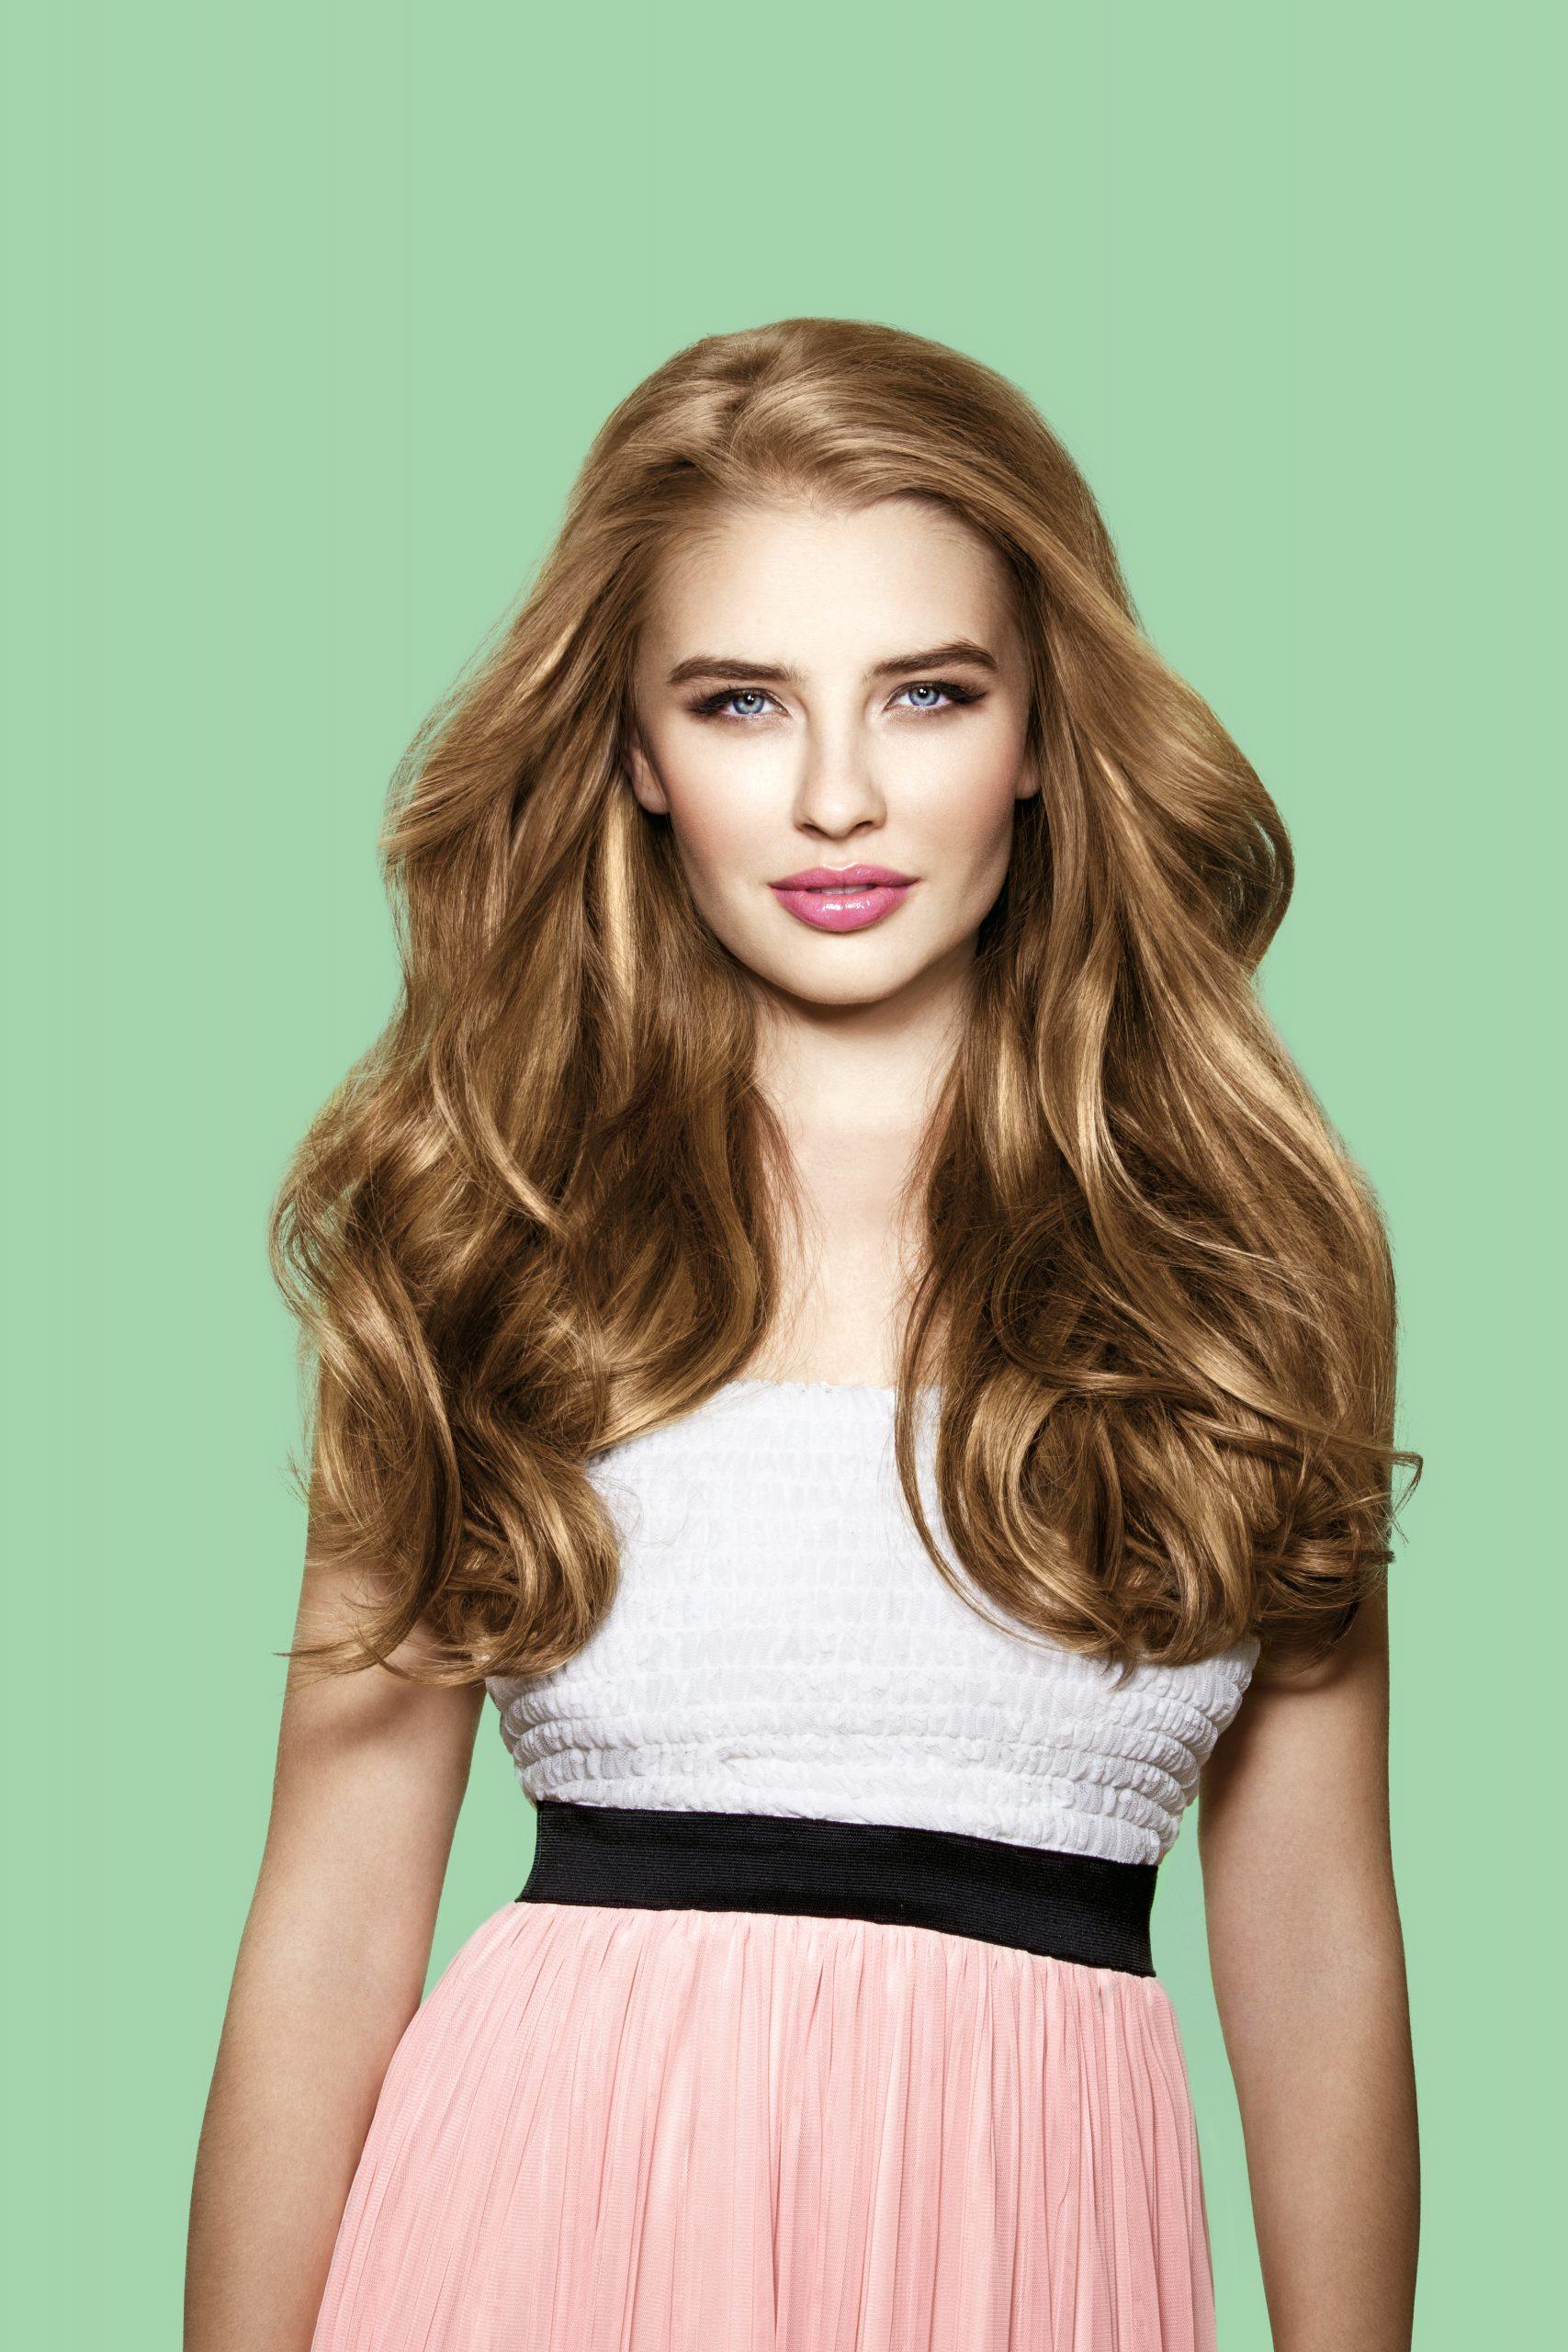 186 Lush Hair 0721_r